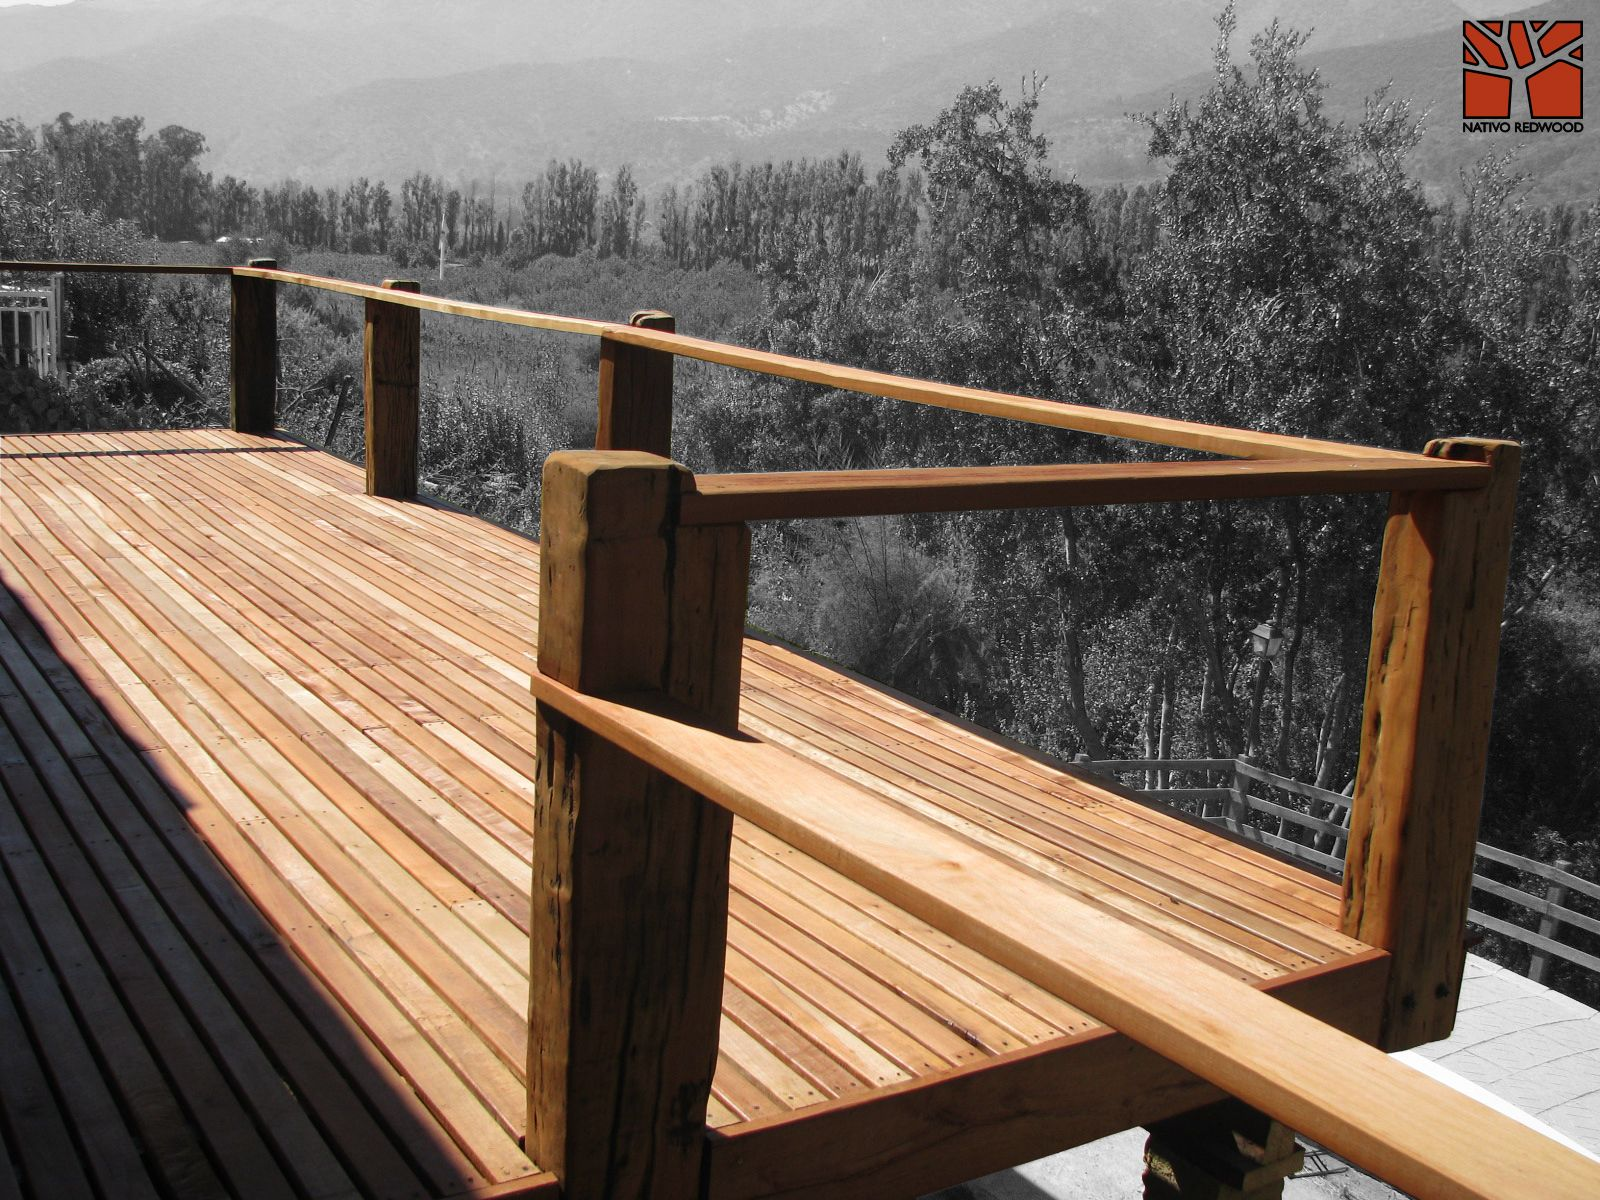 Nativo redwood terraza en casa en caj n del maipo - Barandas de terrazas ...